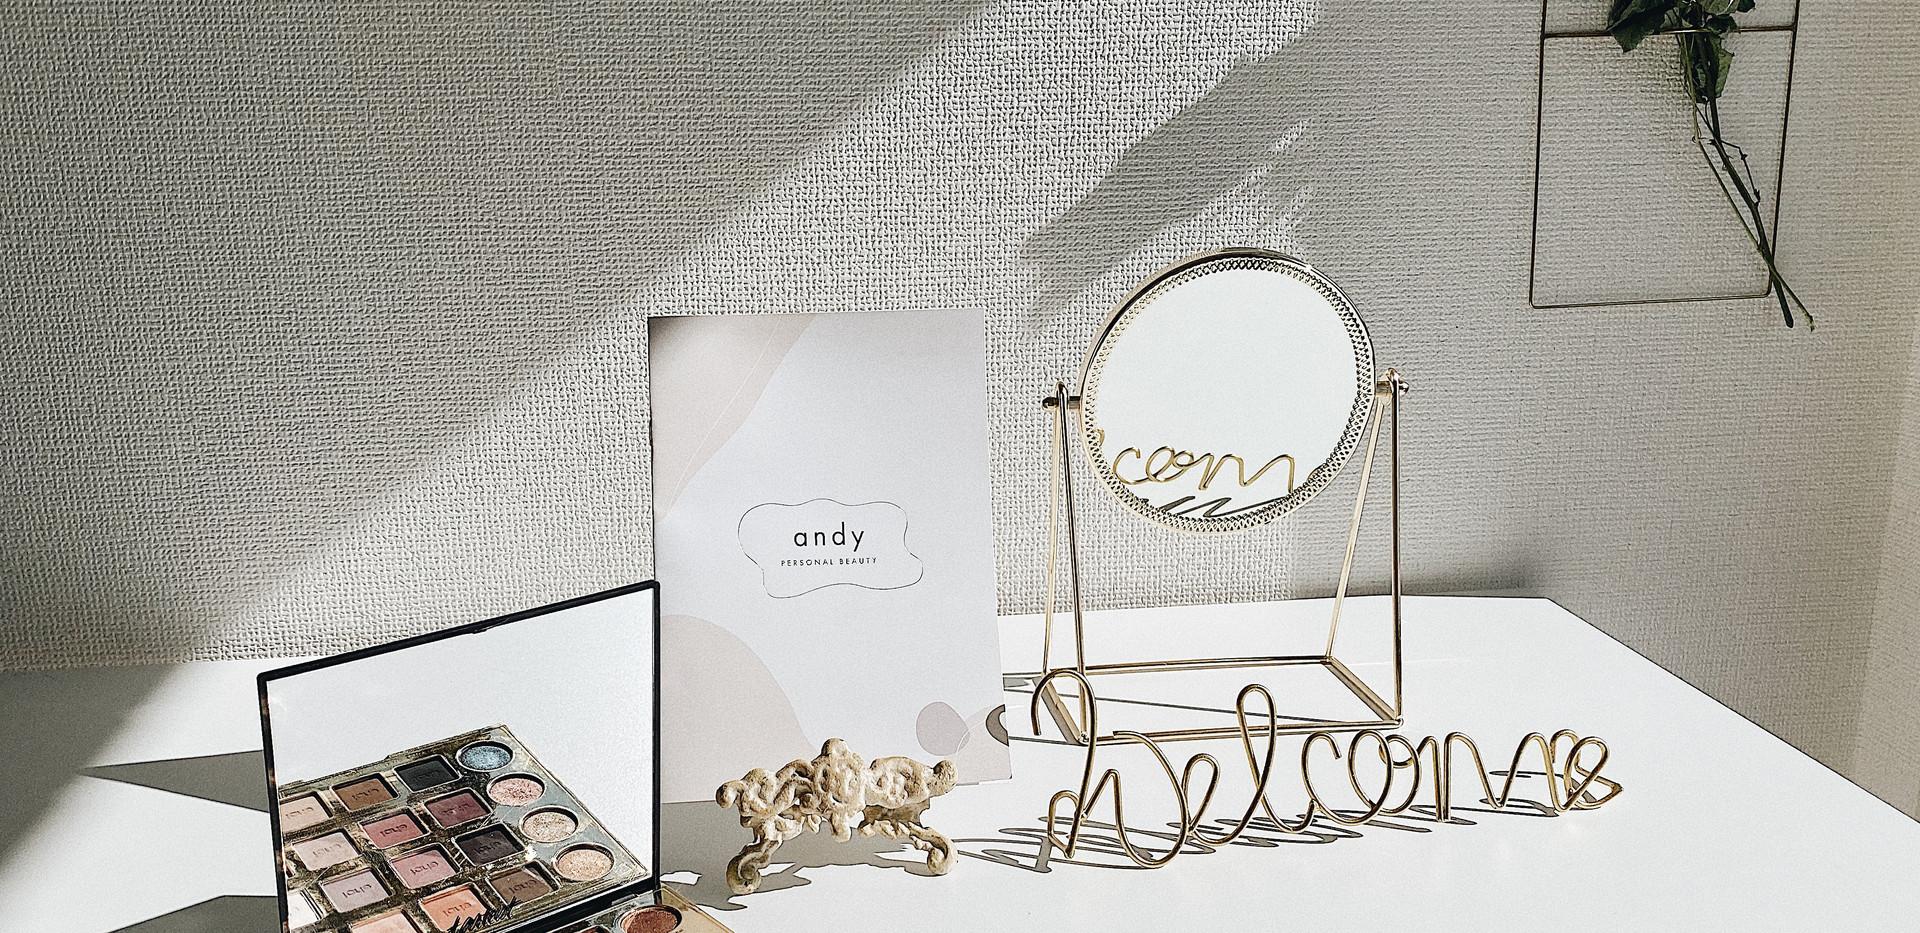 andy_salon